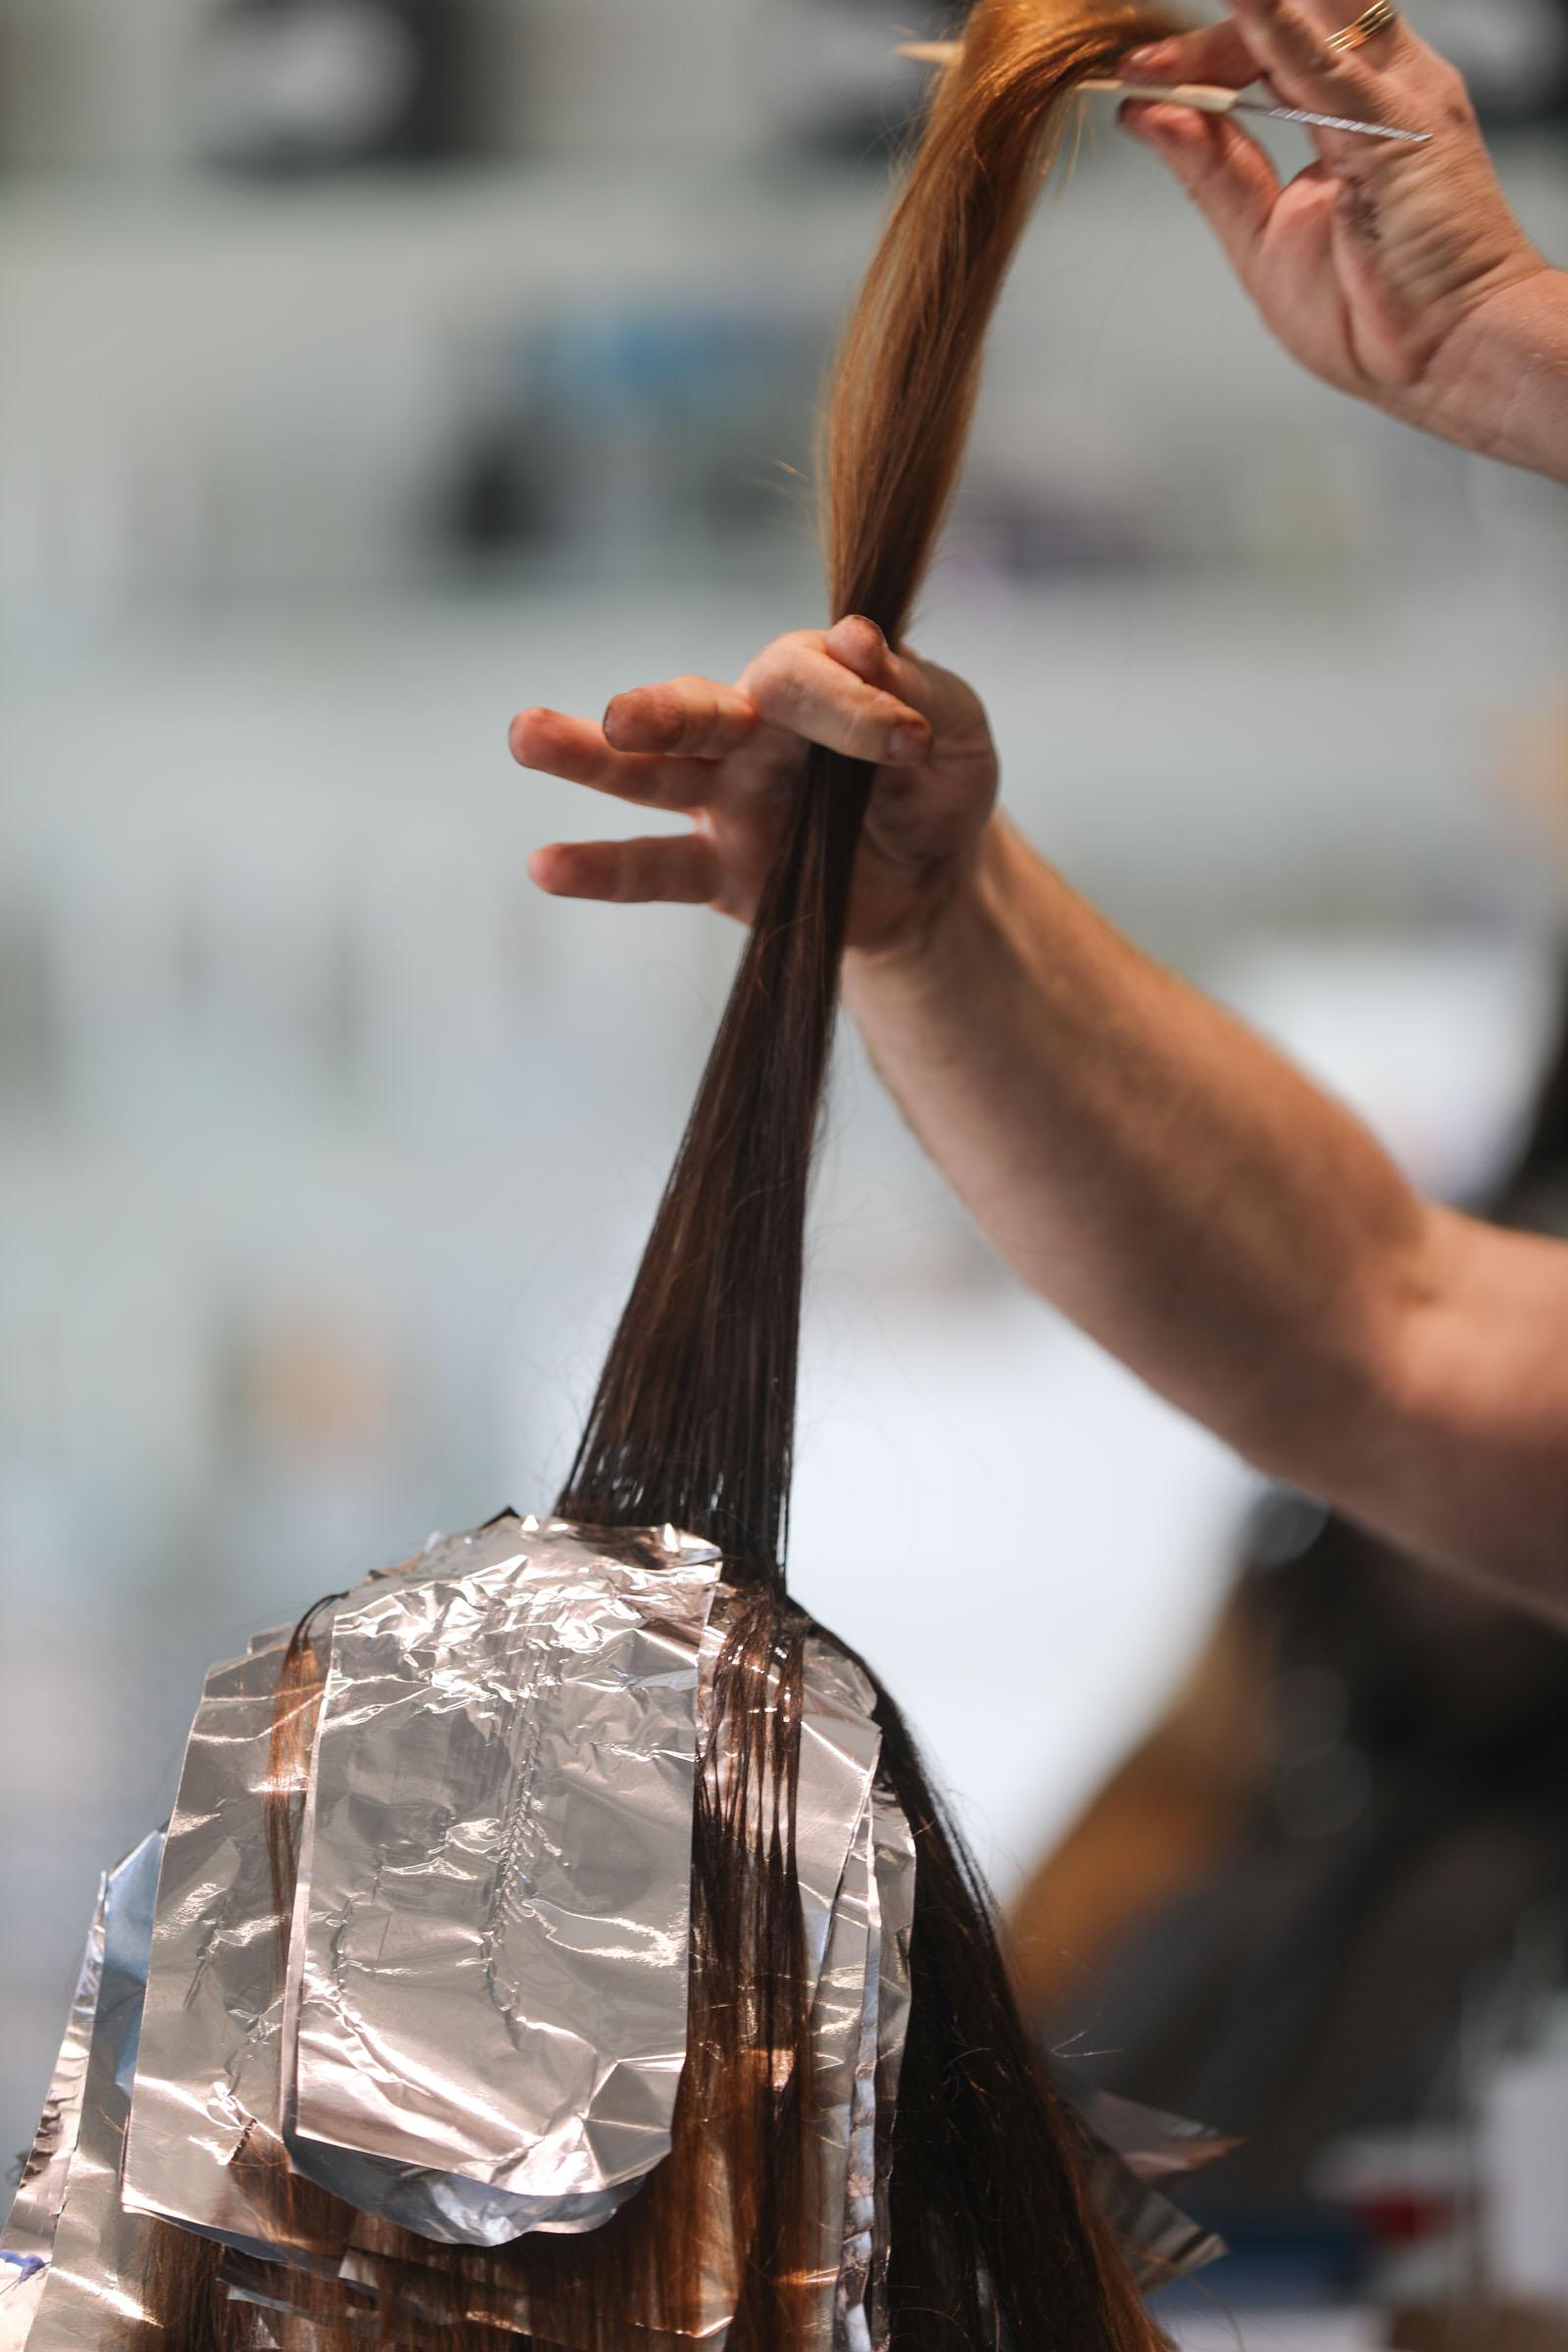 Master Colorist | Educator | Owner of Hair Studio Artists, Eric Charles Mokotoff